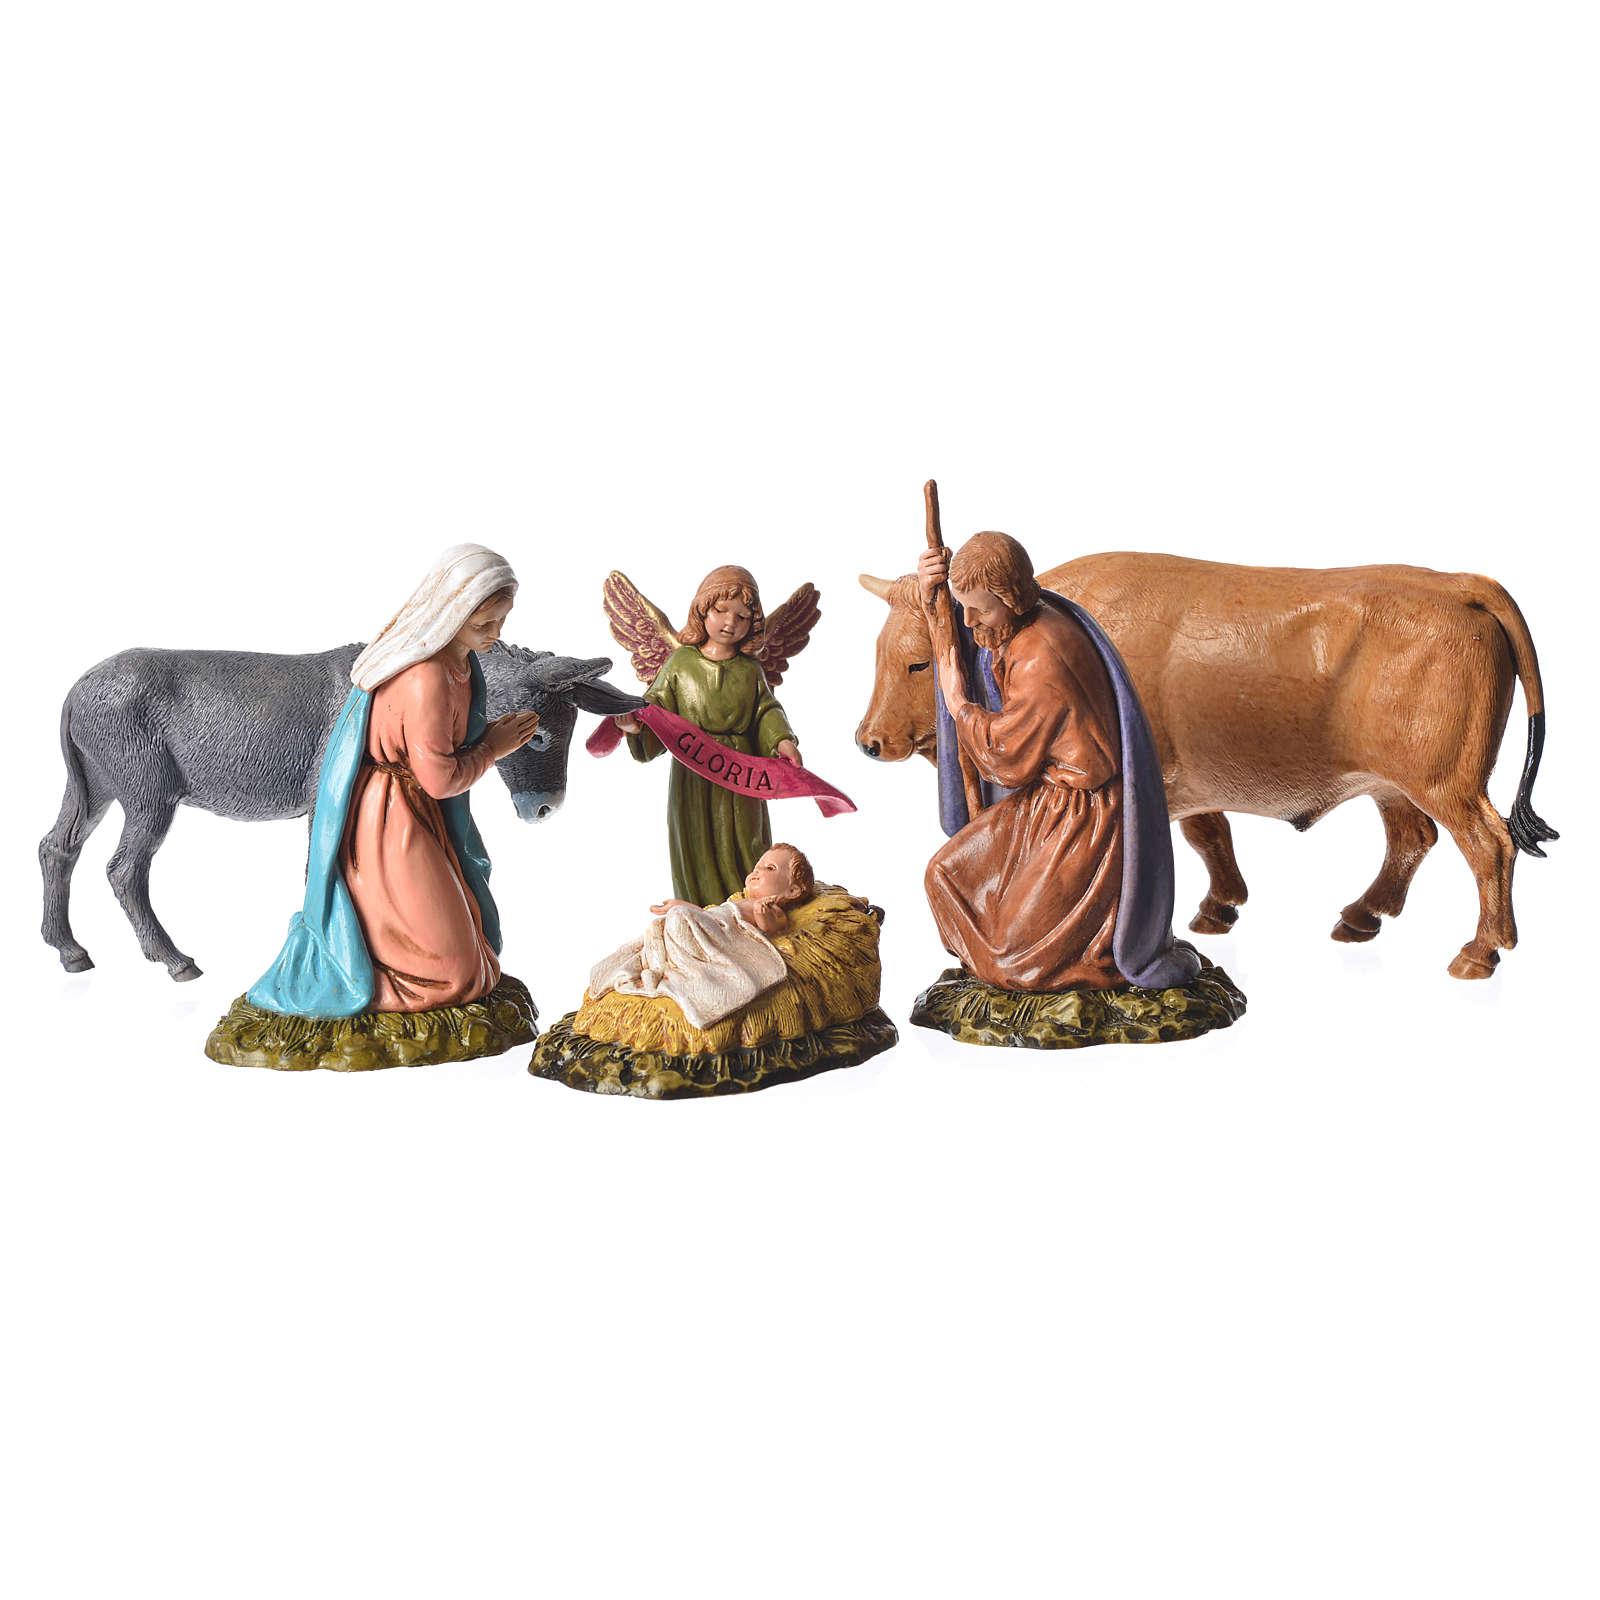 Natividad 11 cm belén Moranduzzo 6 figuras 4